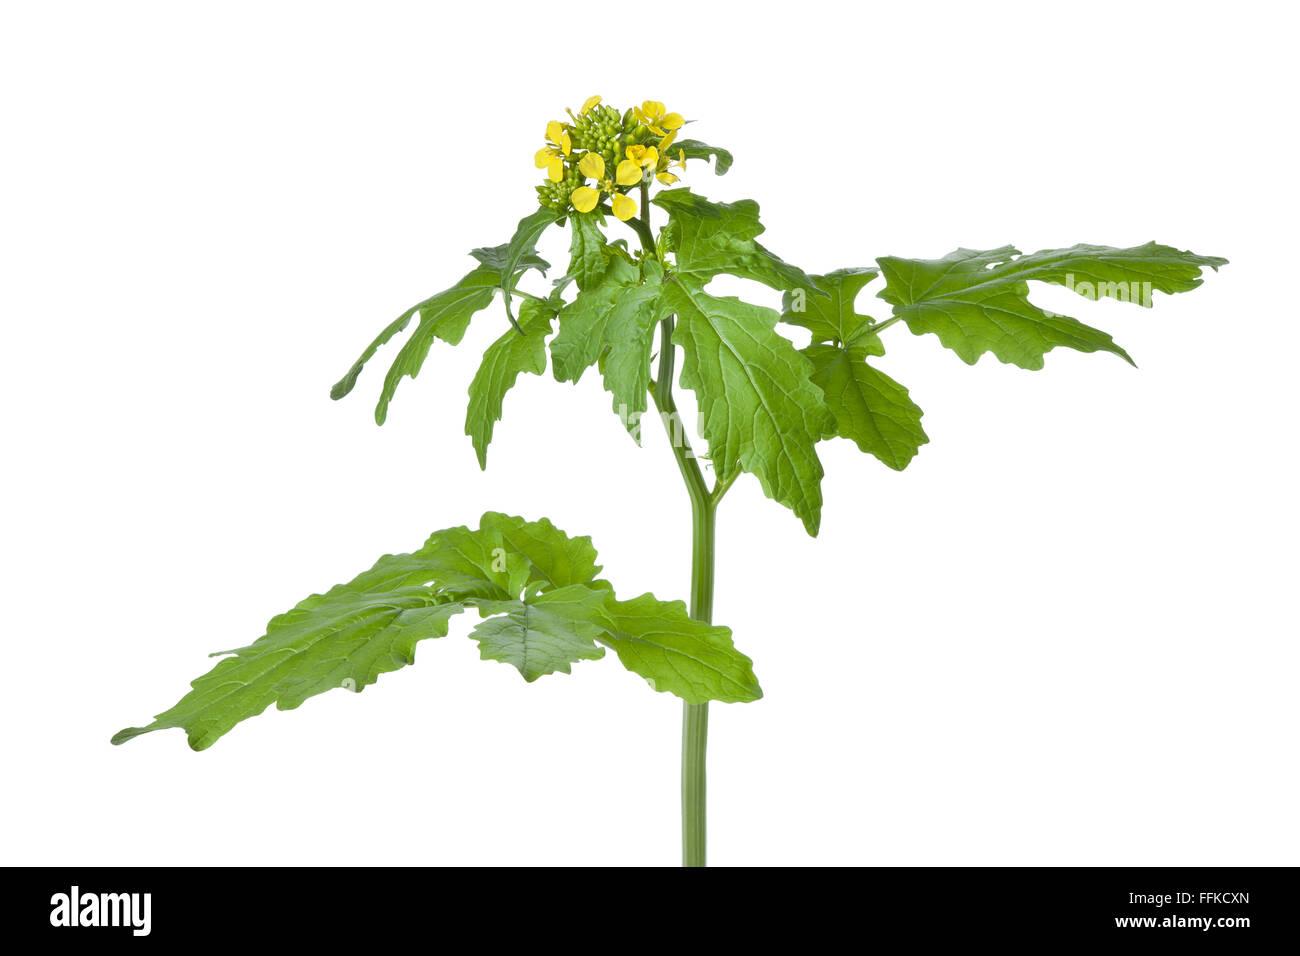 fresh yellow flowering mustard plant on white background stock image